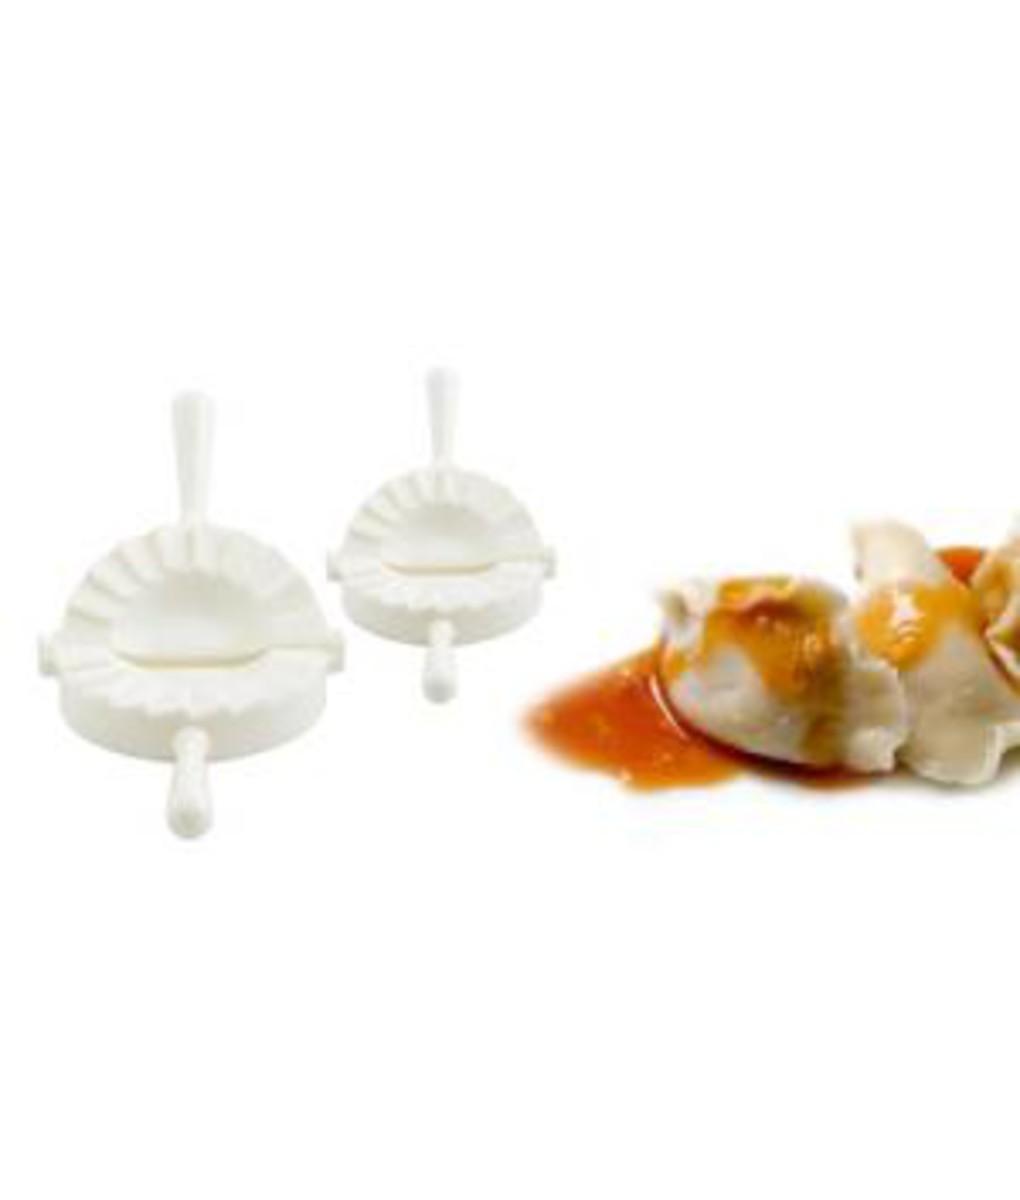 D.Line Dumpling Press Set